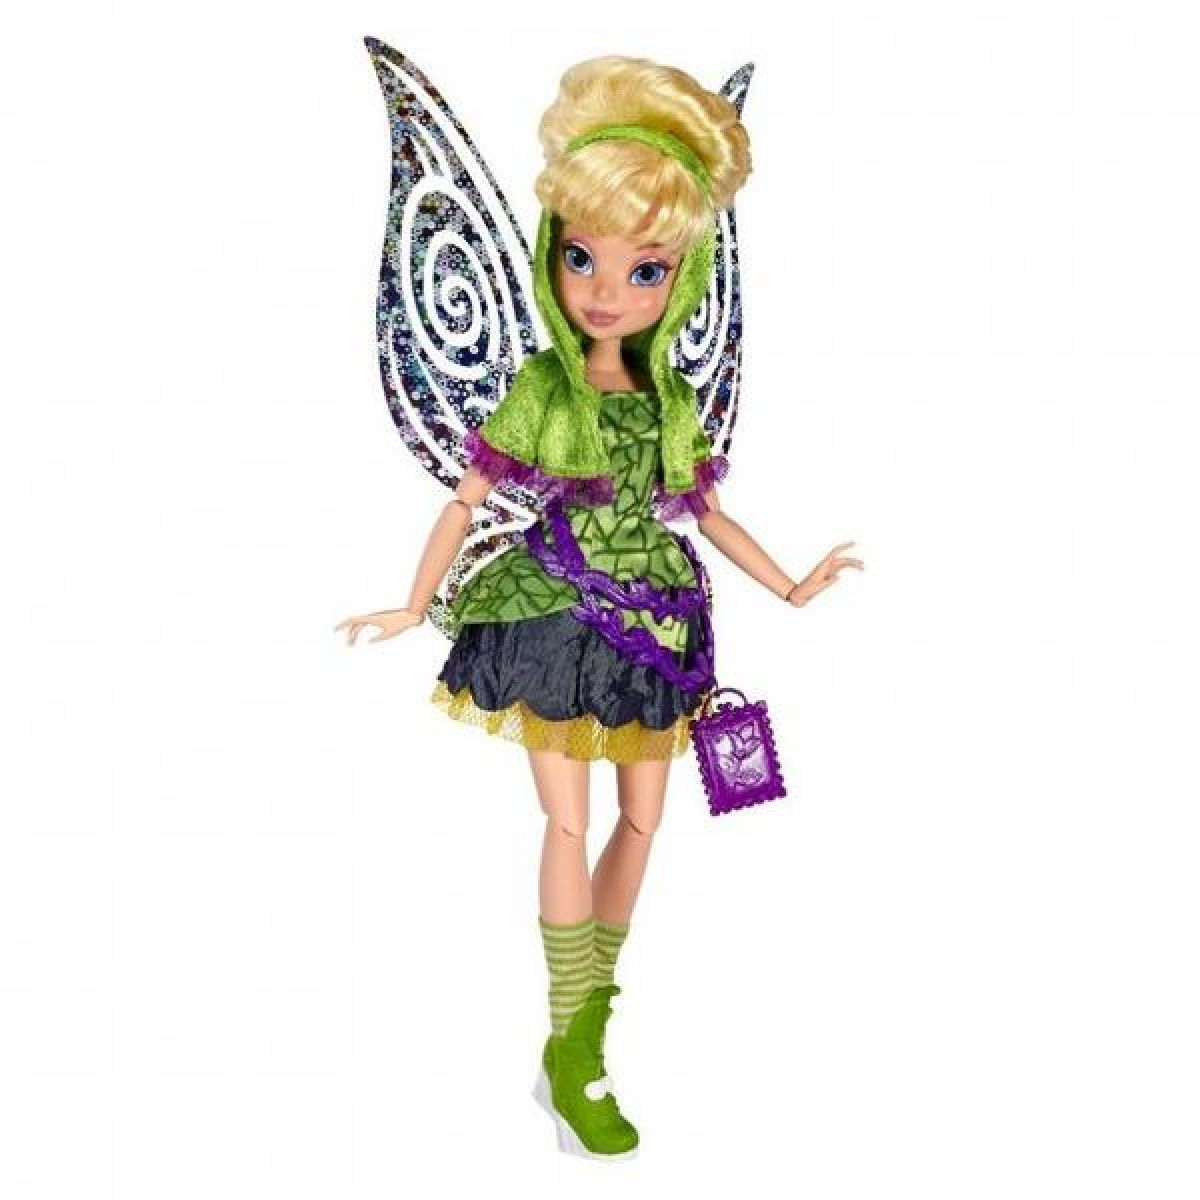 Disney Fairy 22cm Deluxe modní panenka - Tink v sukni